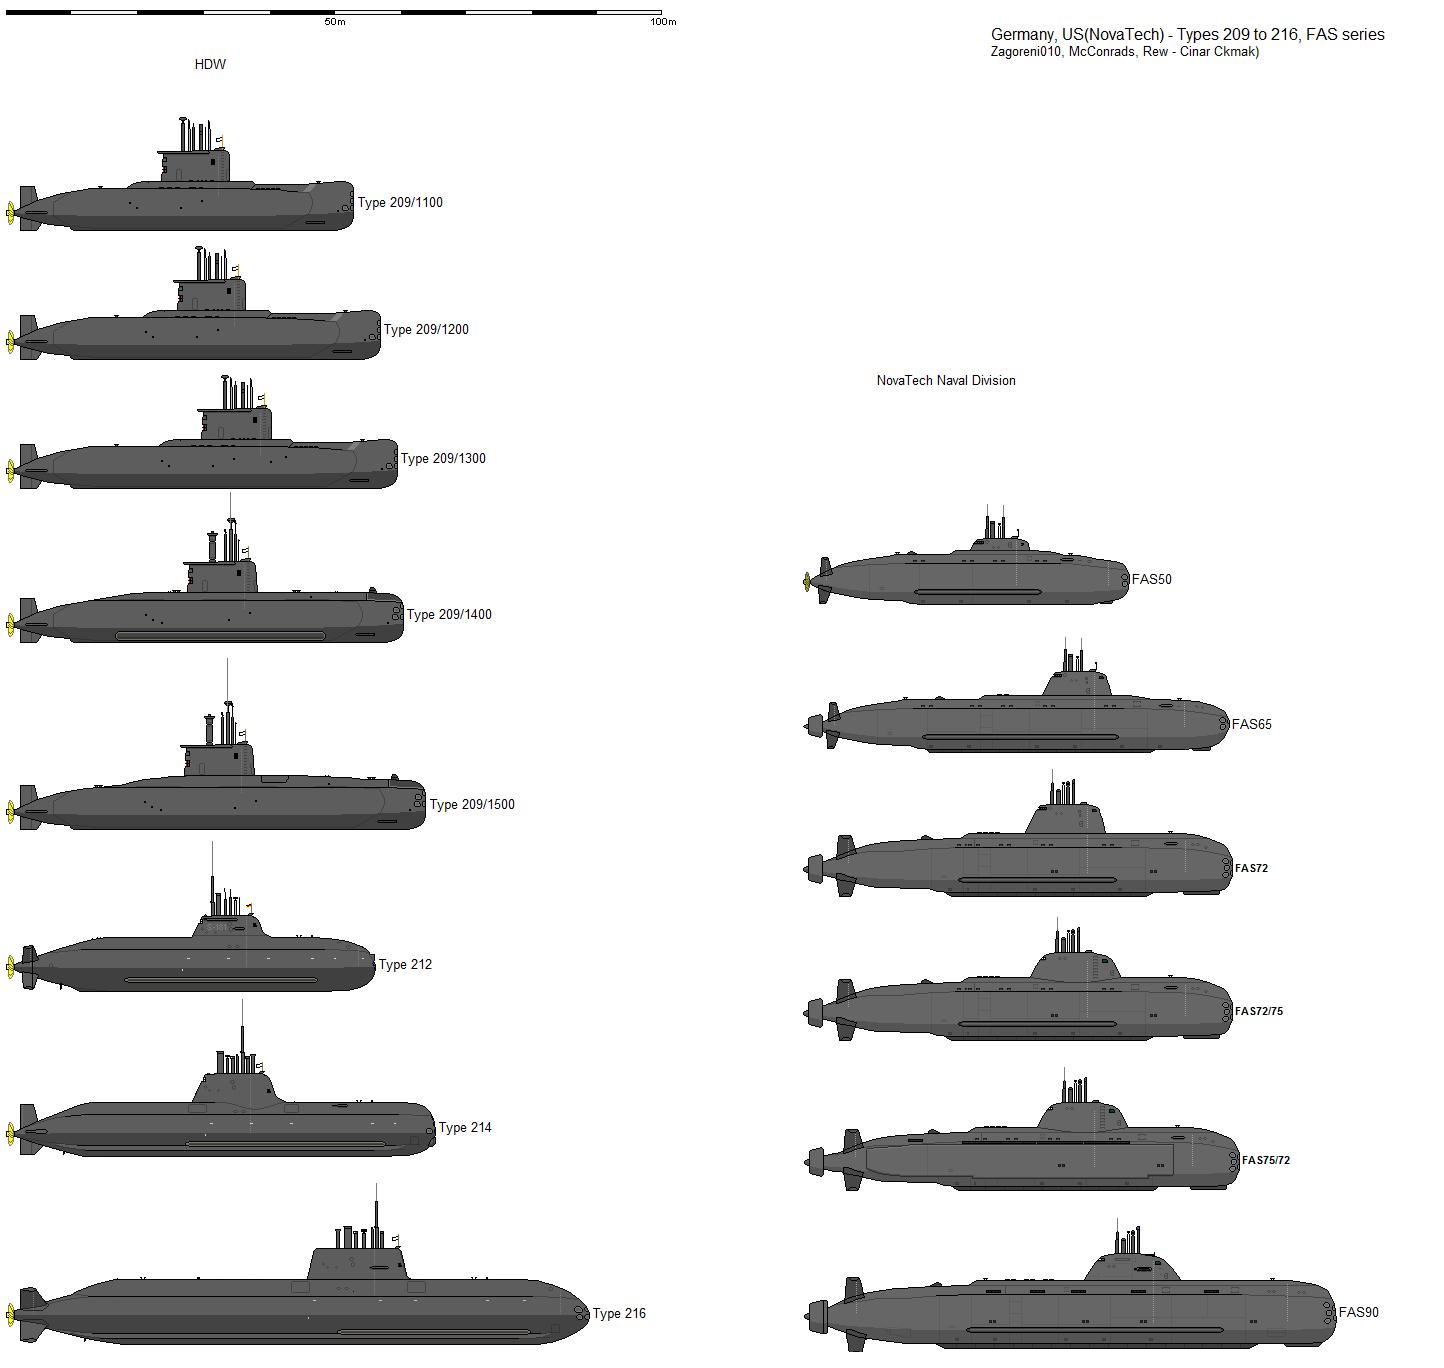 Hdw vs nt submarines by zagoreni010 on deviantart hdw vs nt submarines by zagoreni010 pooptronica